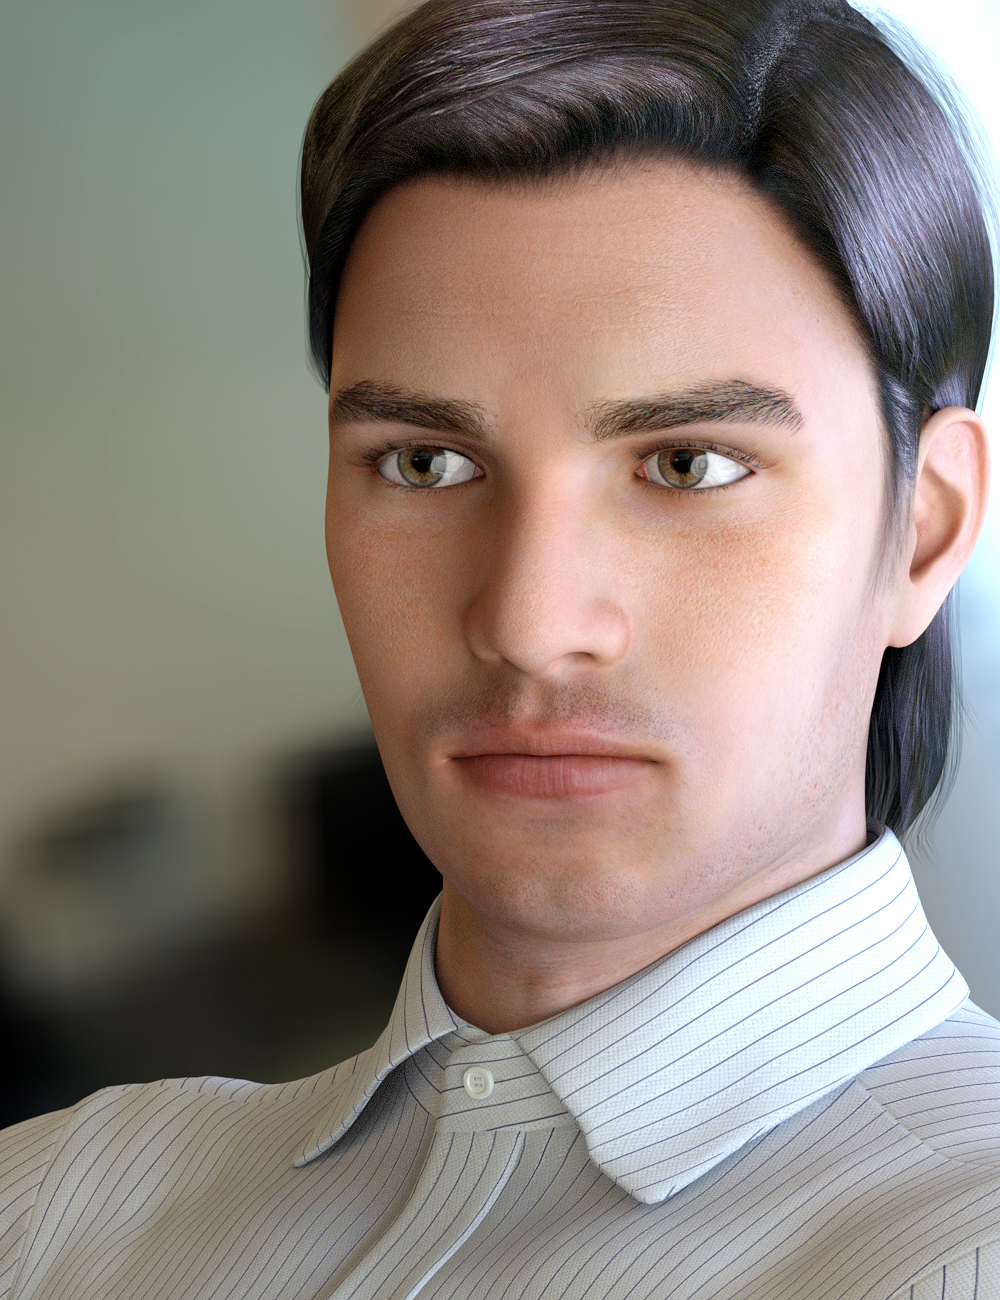 Marcelo for Genesis 8 Male by: Virtual_World, 3D Models by Daz 3D